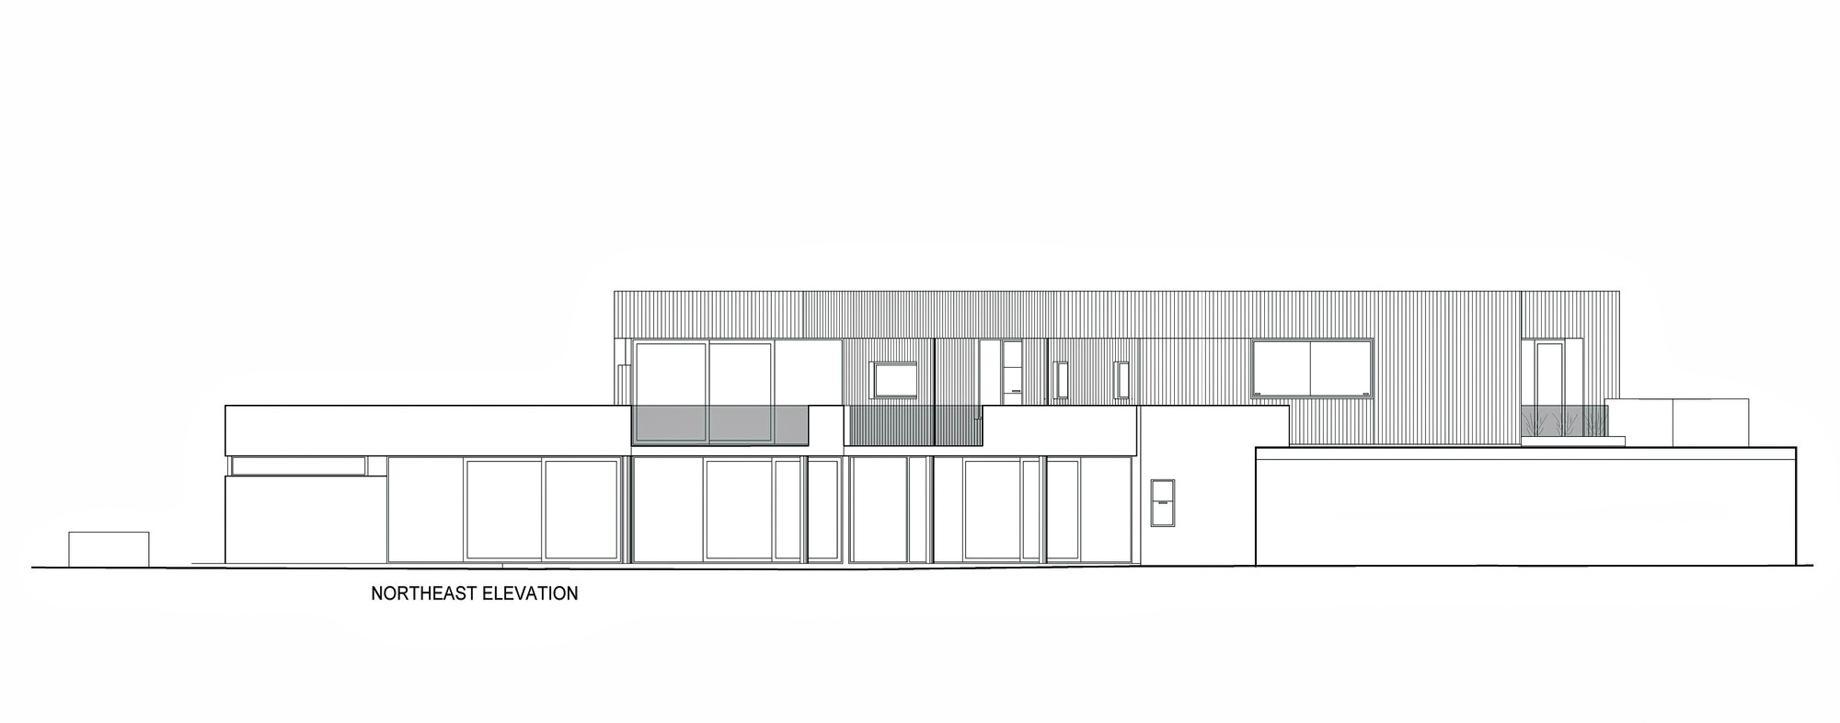 Northeast Elevation - Dalkeith Luxury Residence - 135 Circe Cir, Dalkeith, WA, Australia